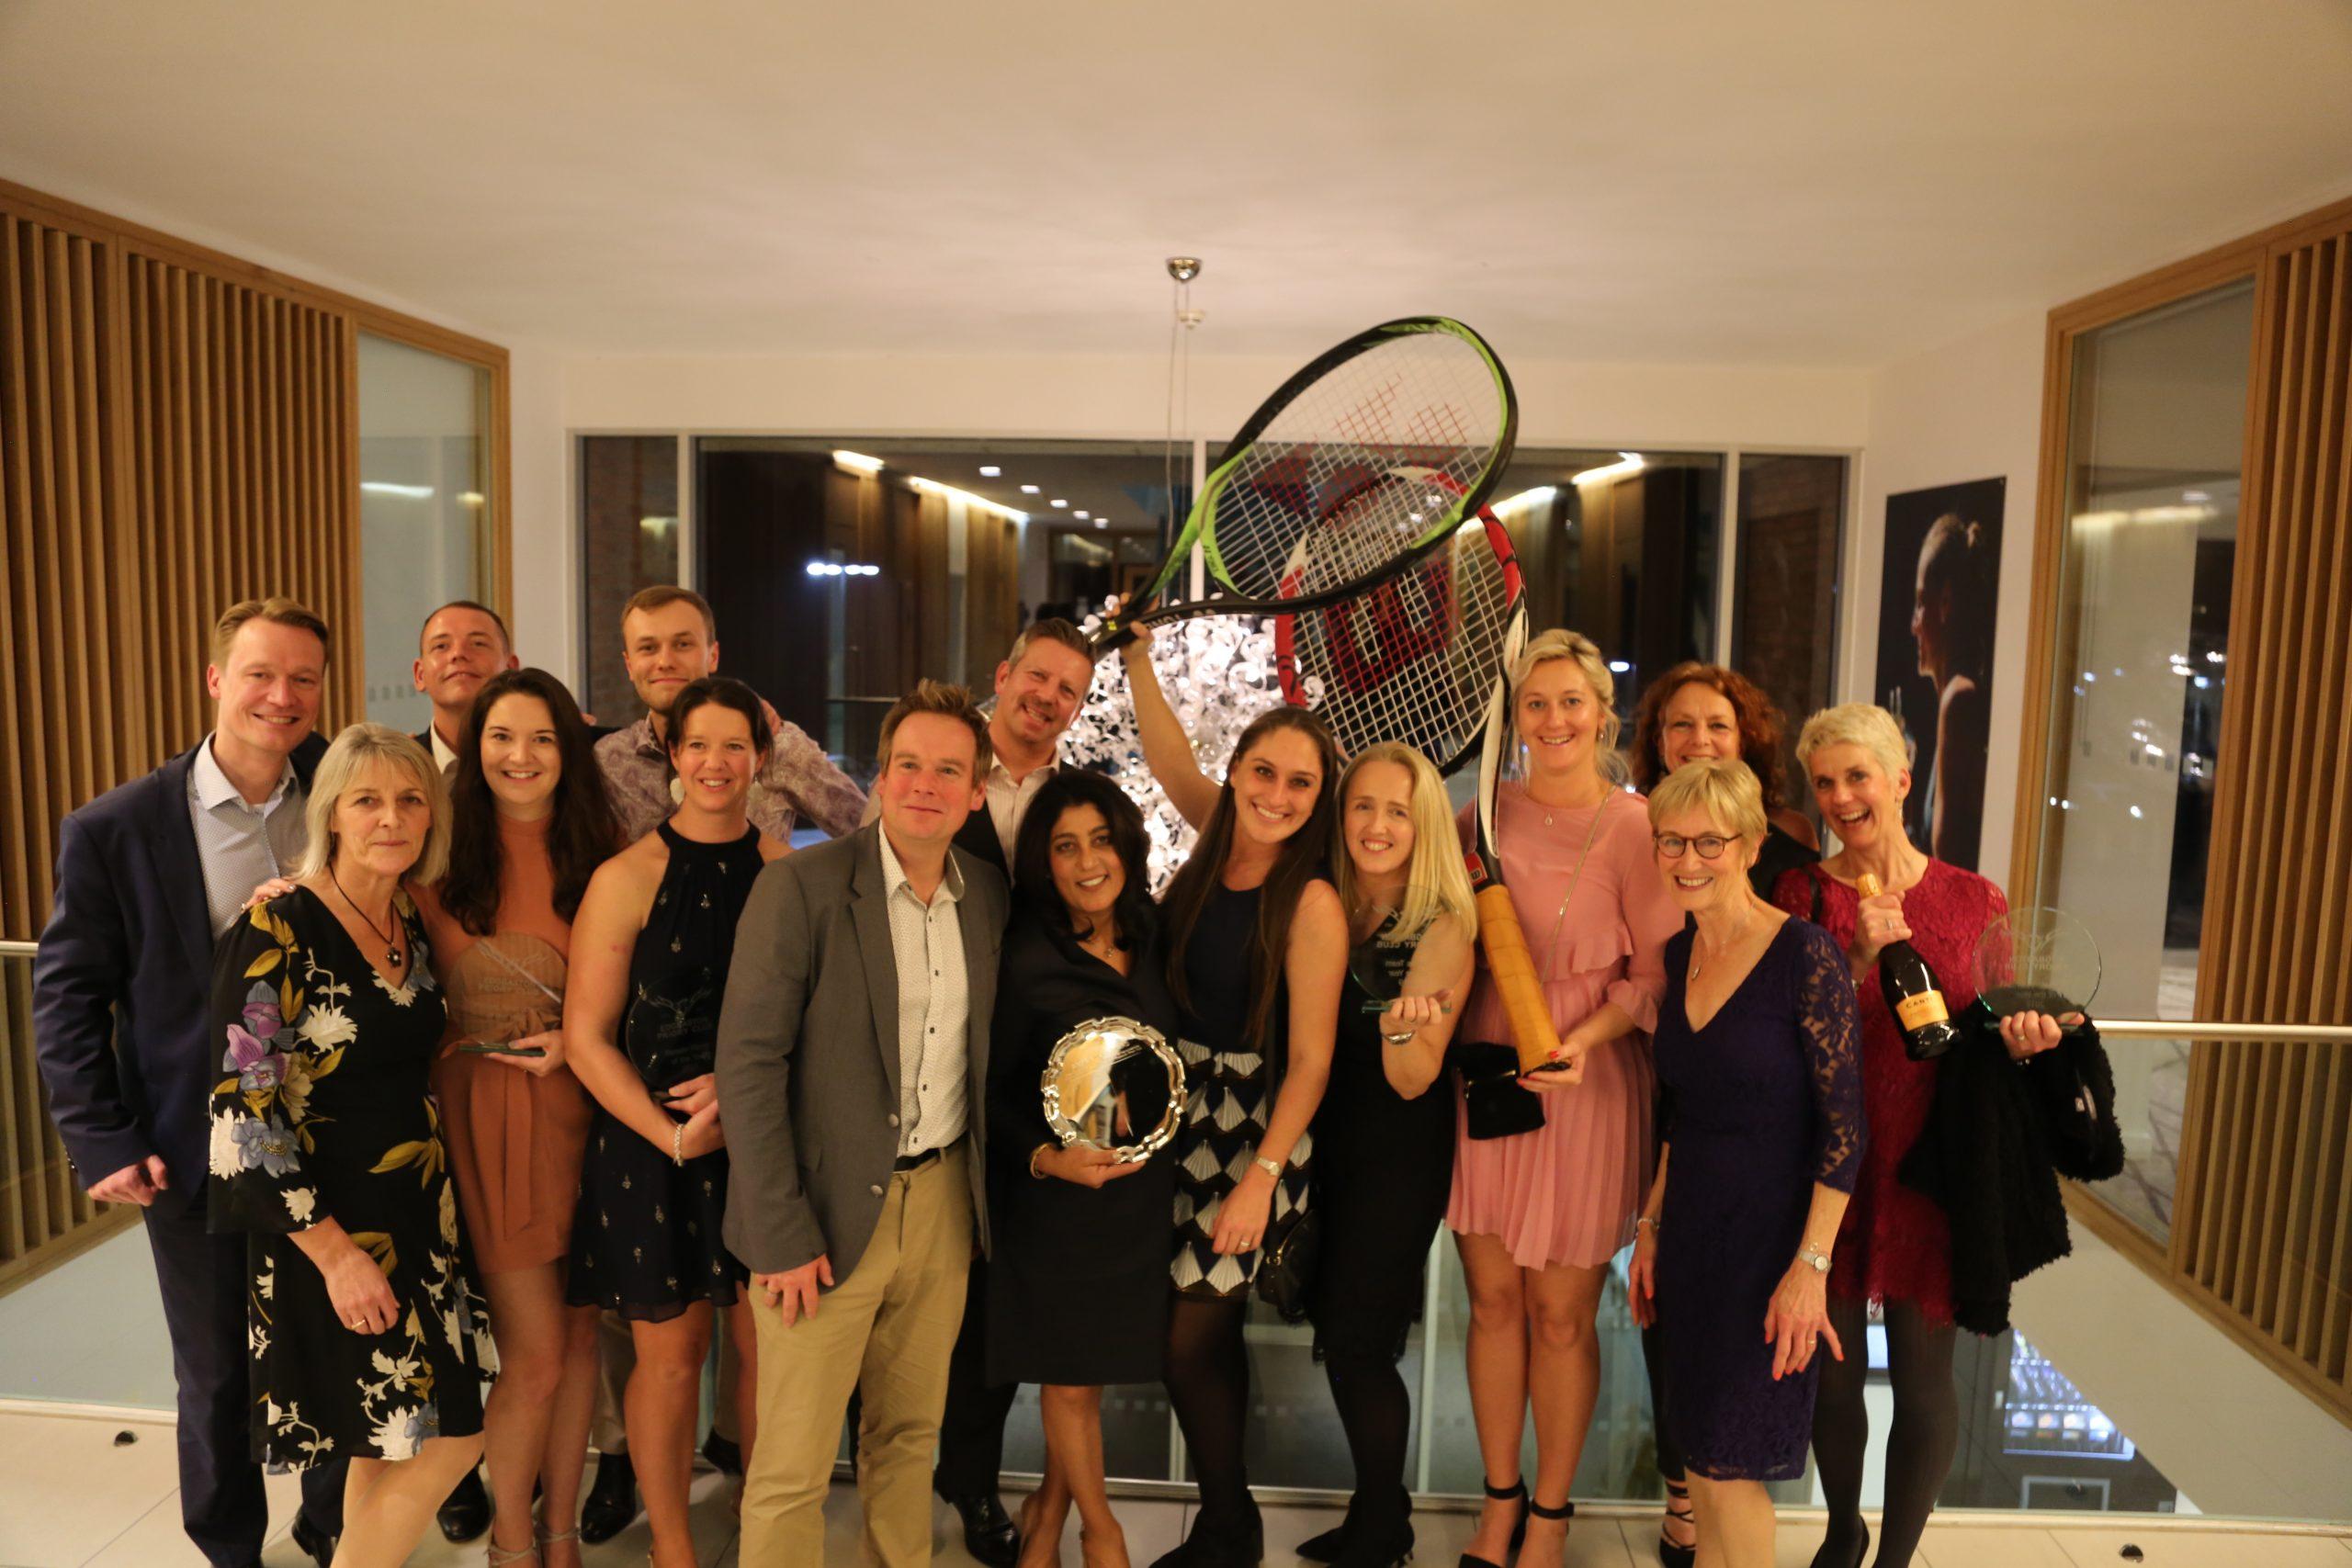 2019 Tennis Awards Winners